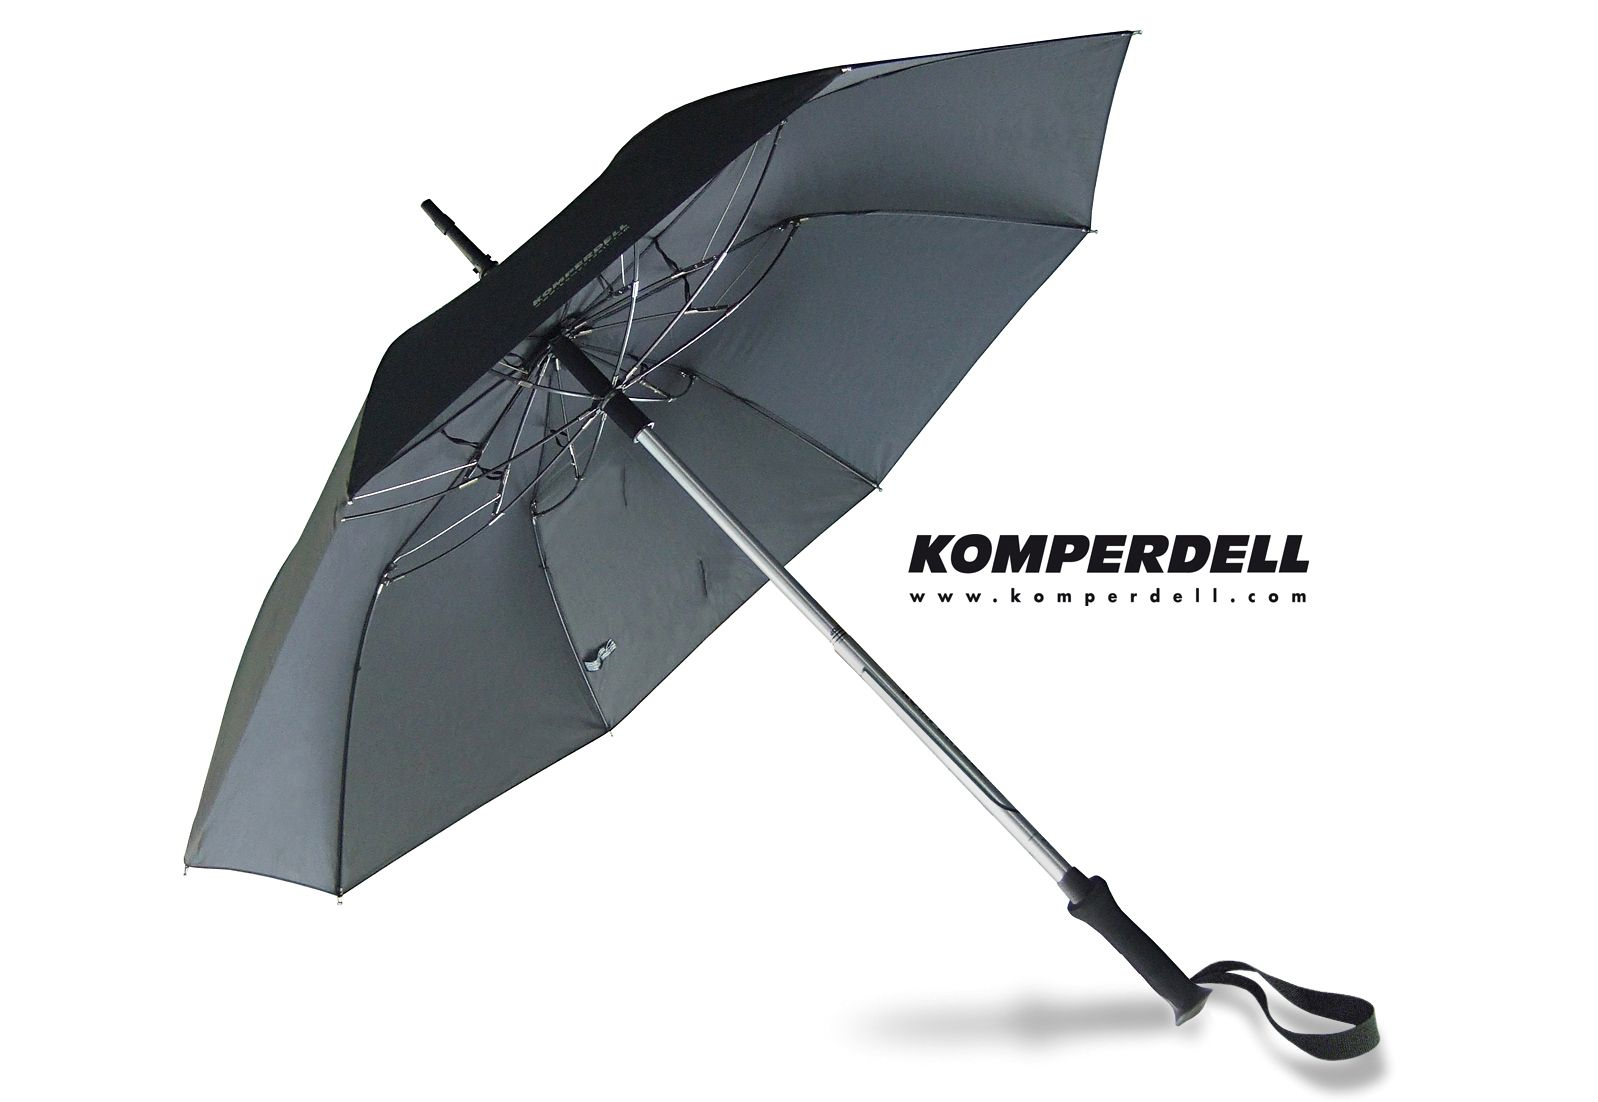 EUROSCHIRM® Euroschirm® Regenschirm - Wanderstock, »KOMPERDELL Teleskop-Wanderstock m. integriertem Schirm«